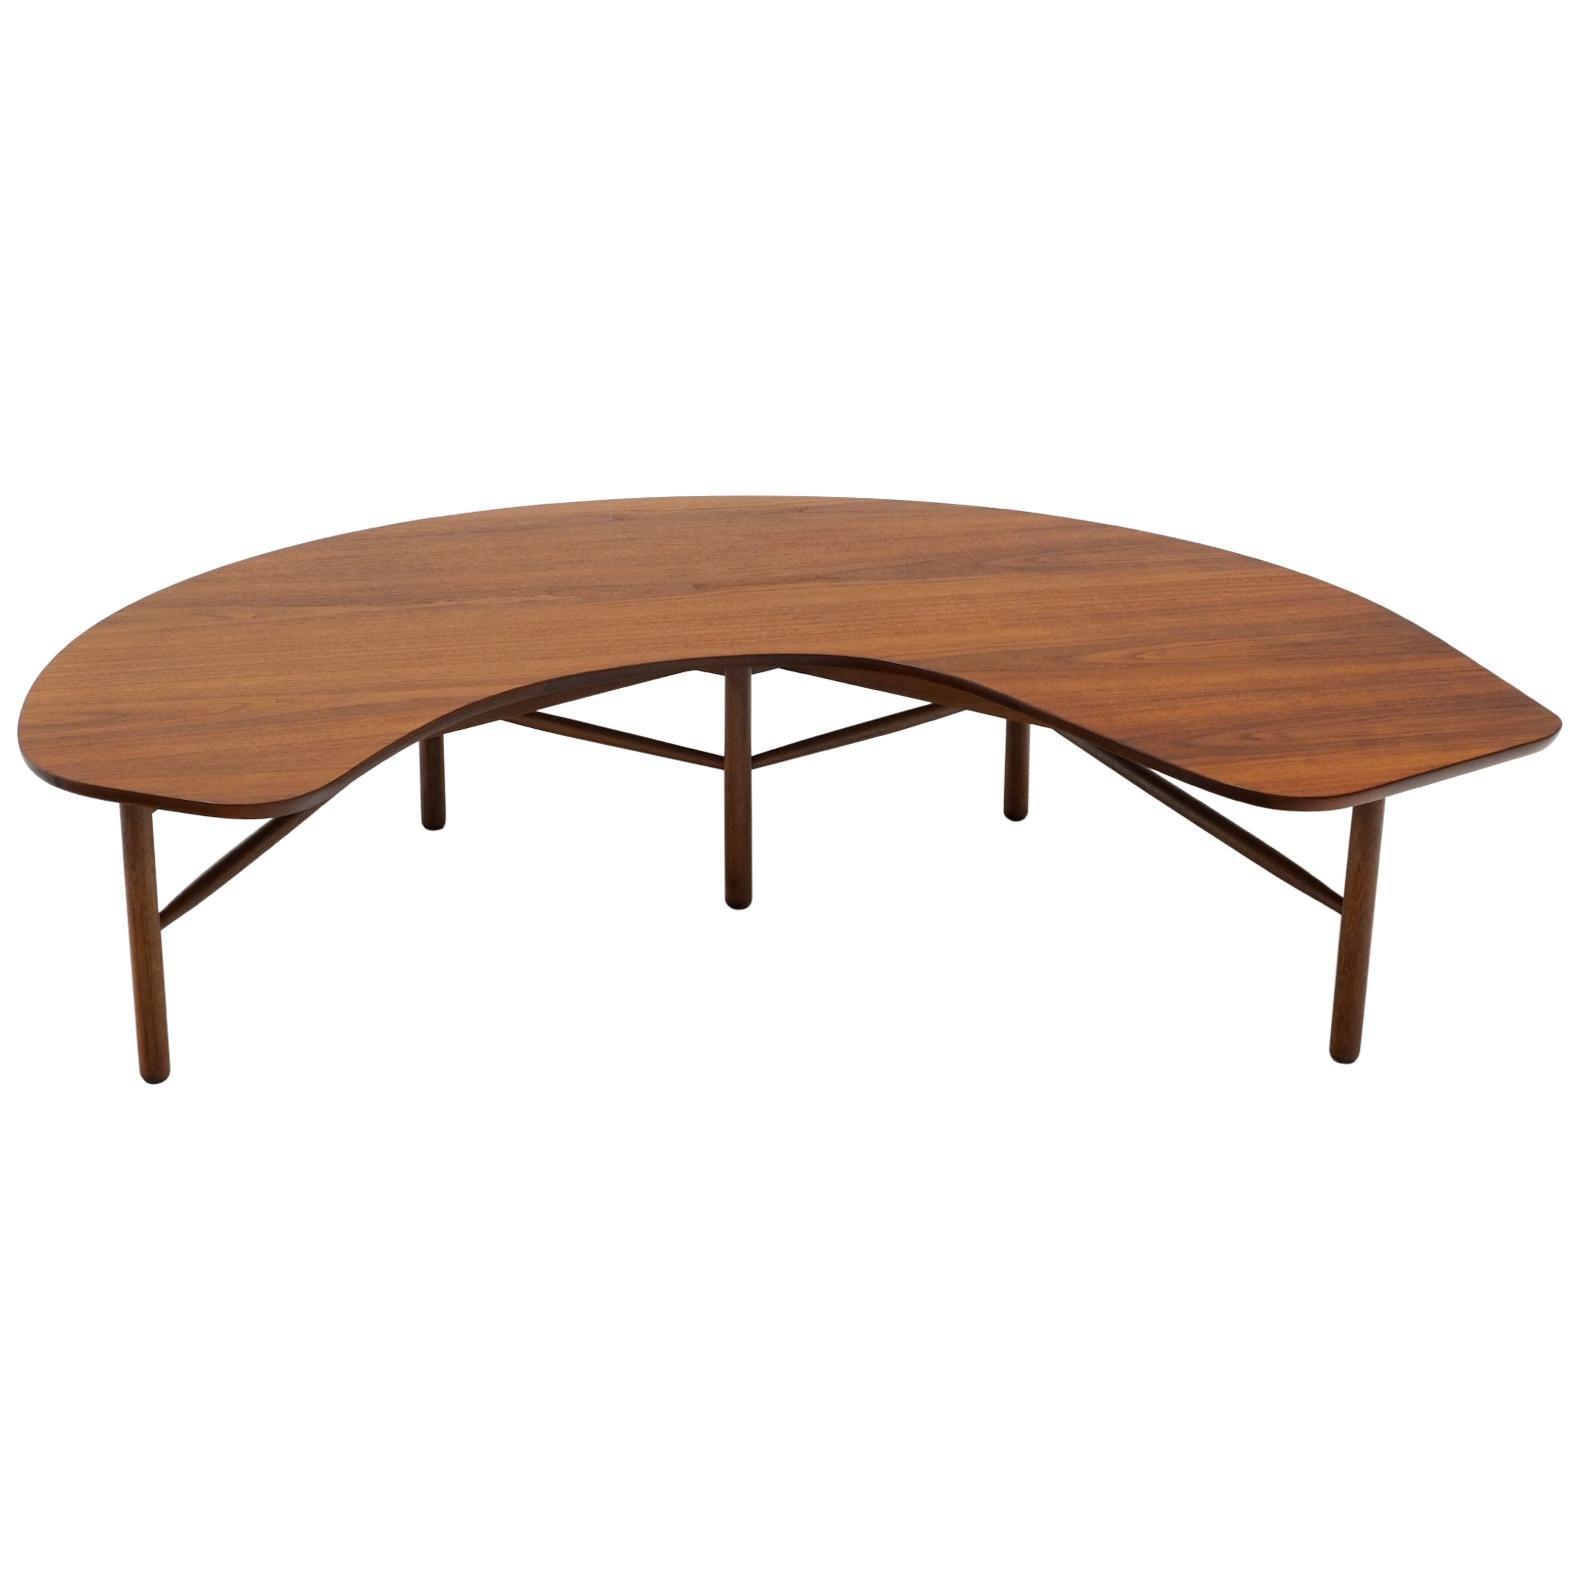 Greta Grossman Boomerang Coffee Table, Walnut, 1950s, Rare, Excellent Condition